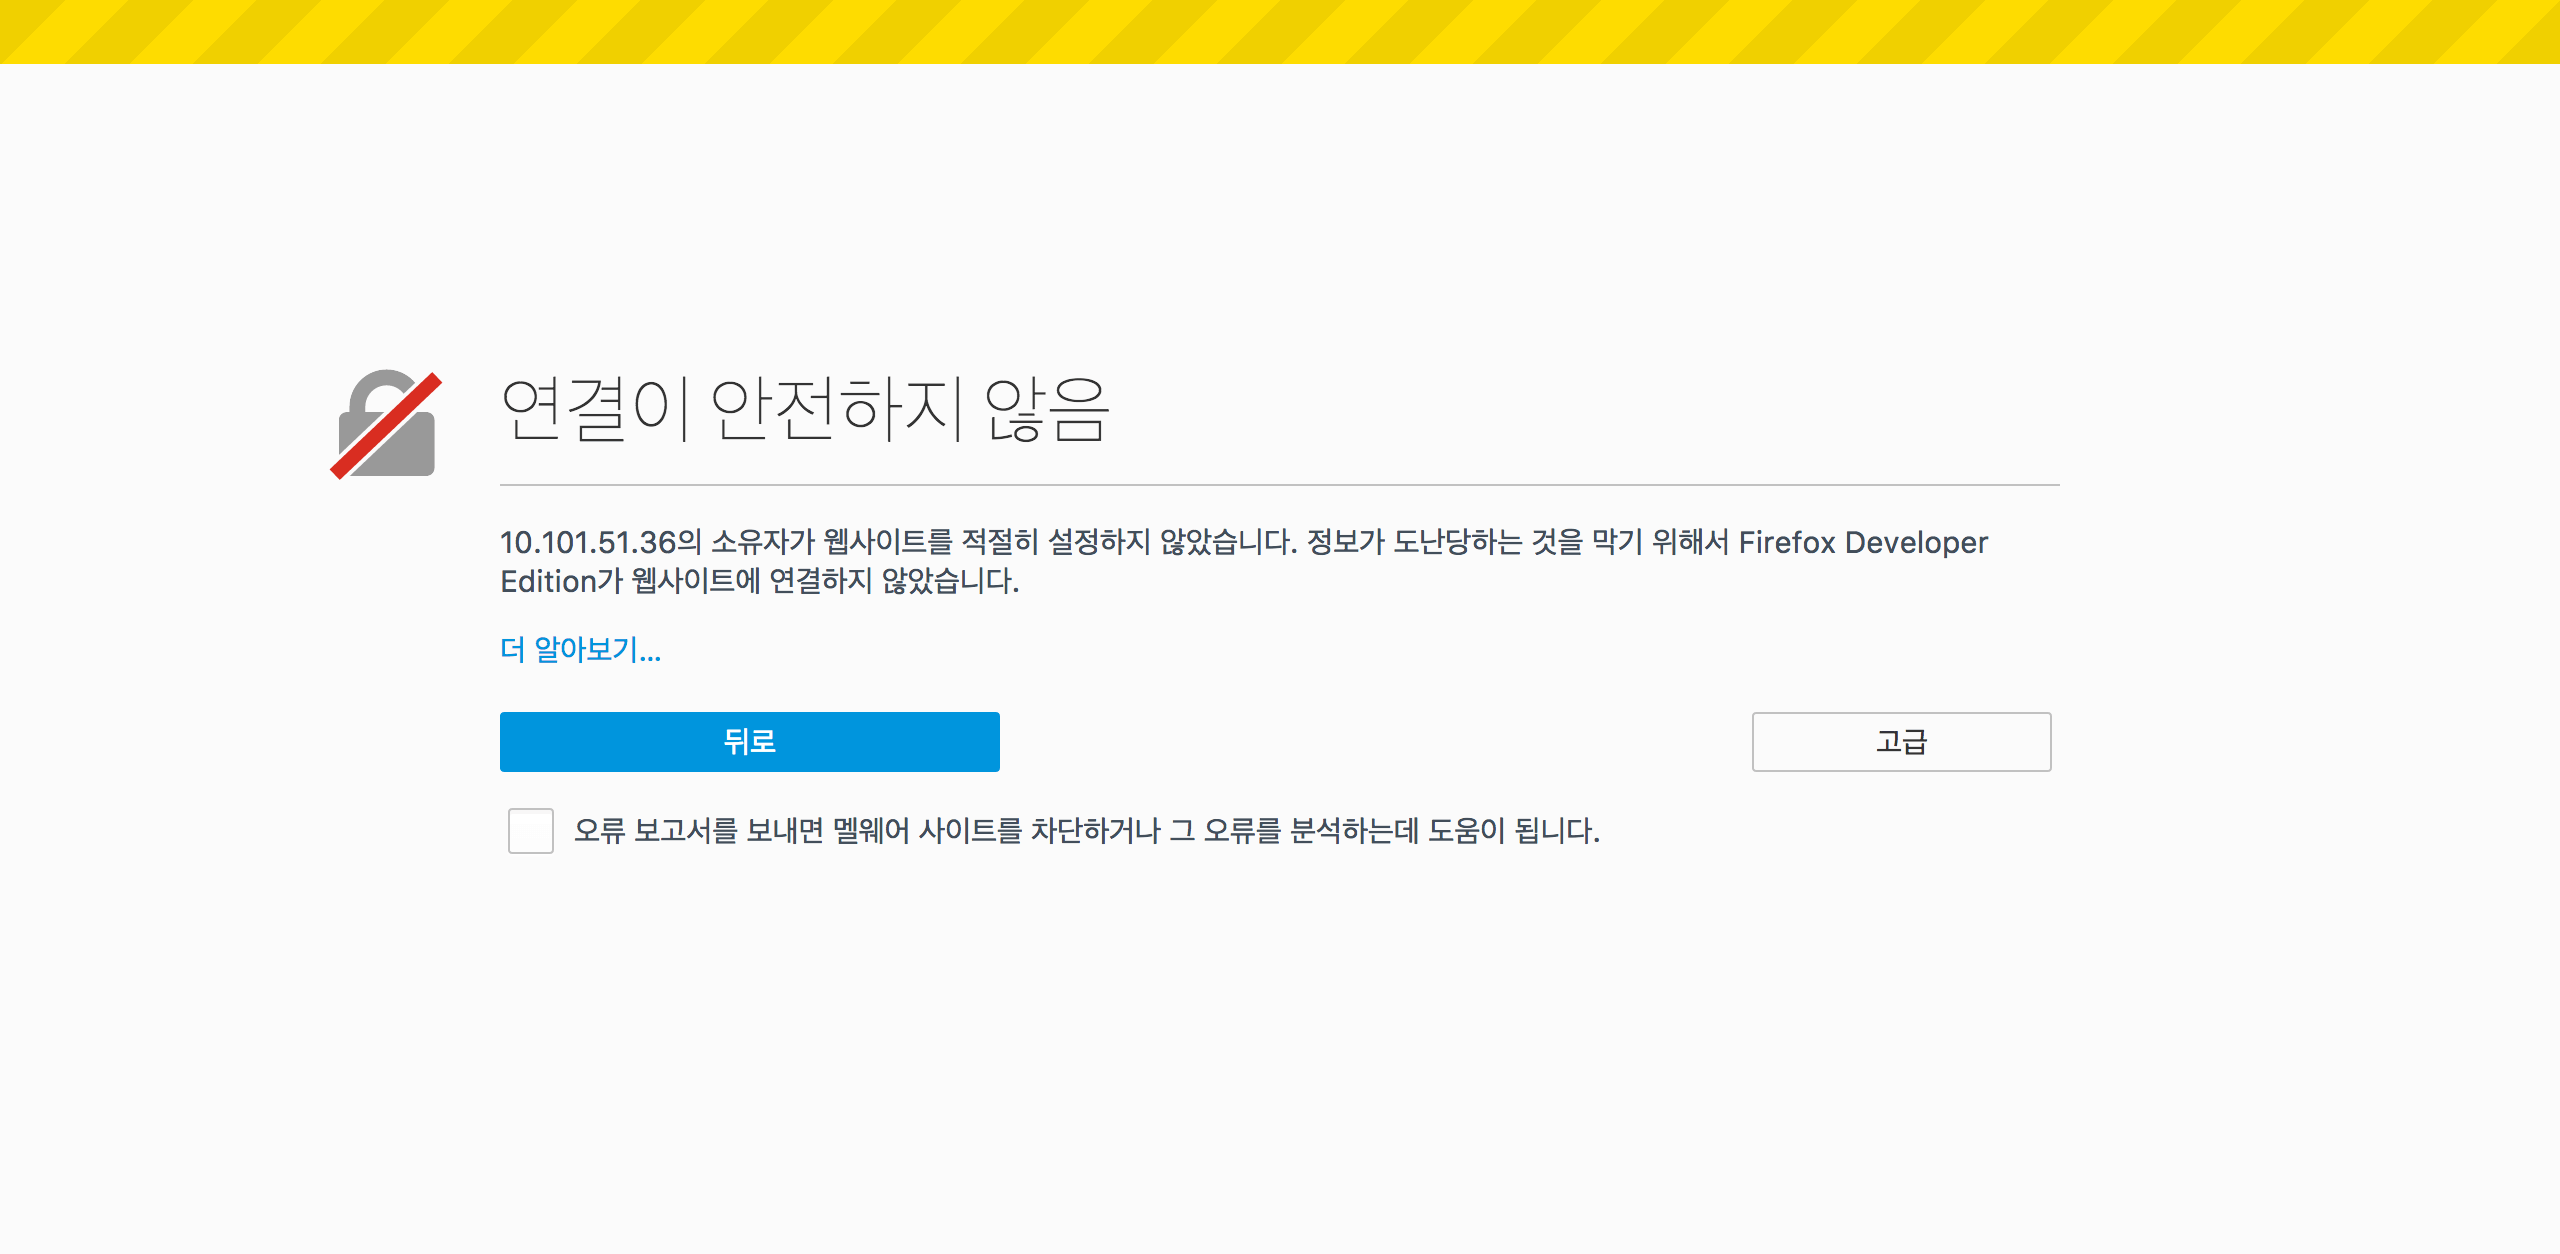 HTTPS에서만 위치 정보 사용 가능